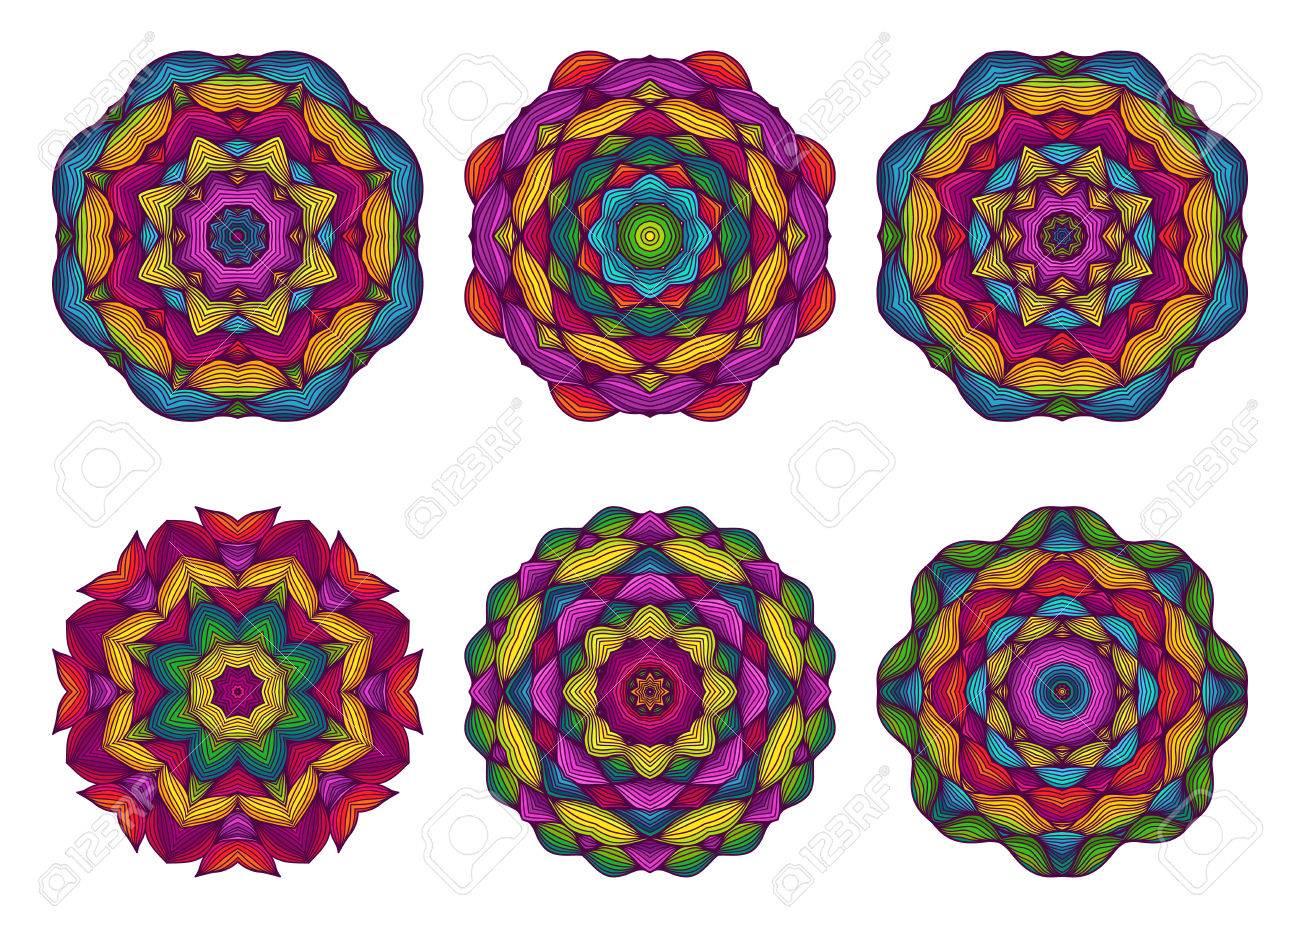 Conjunto De Mandalas Flores Dibujadas A Mano Hermosas Fondo Floral